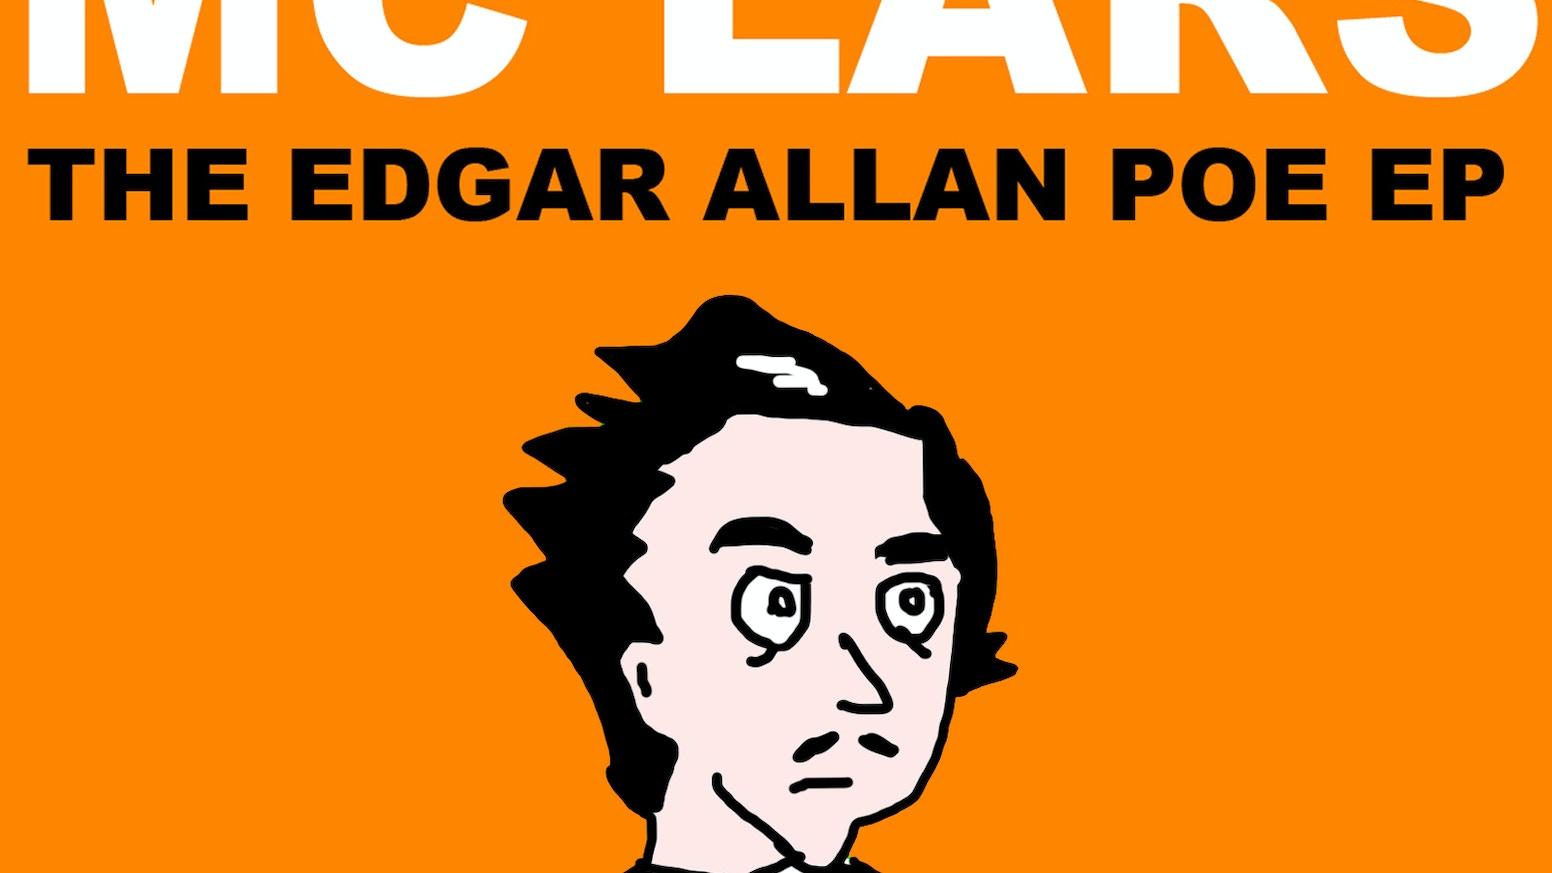 mc lars greatest hits on vinyl edgar allan poe ep by